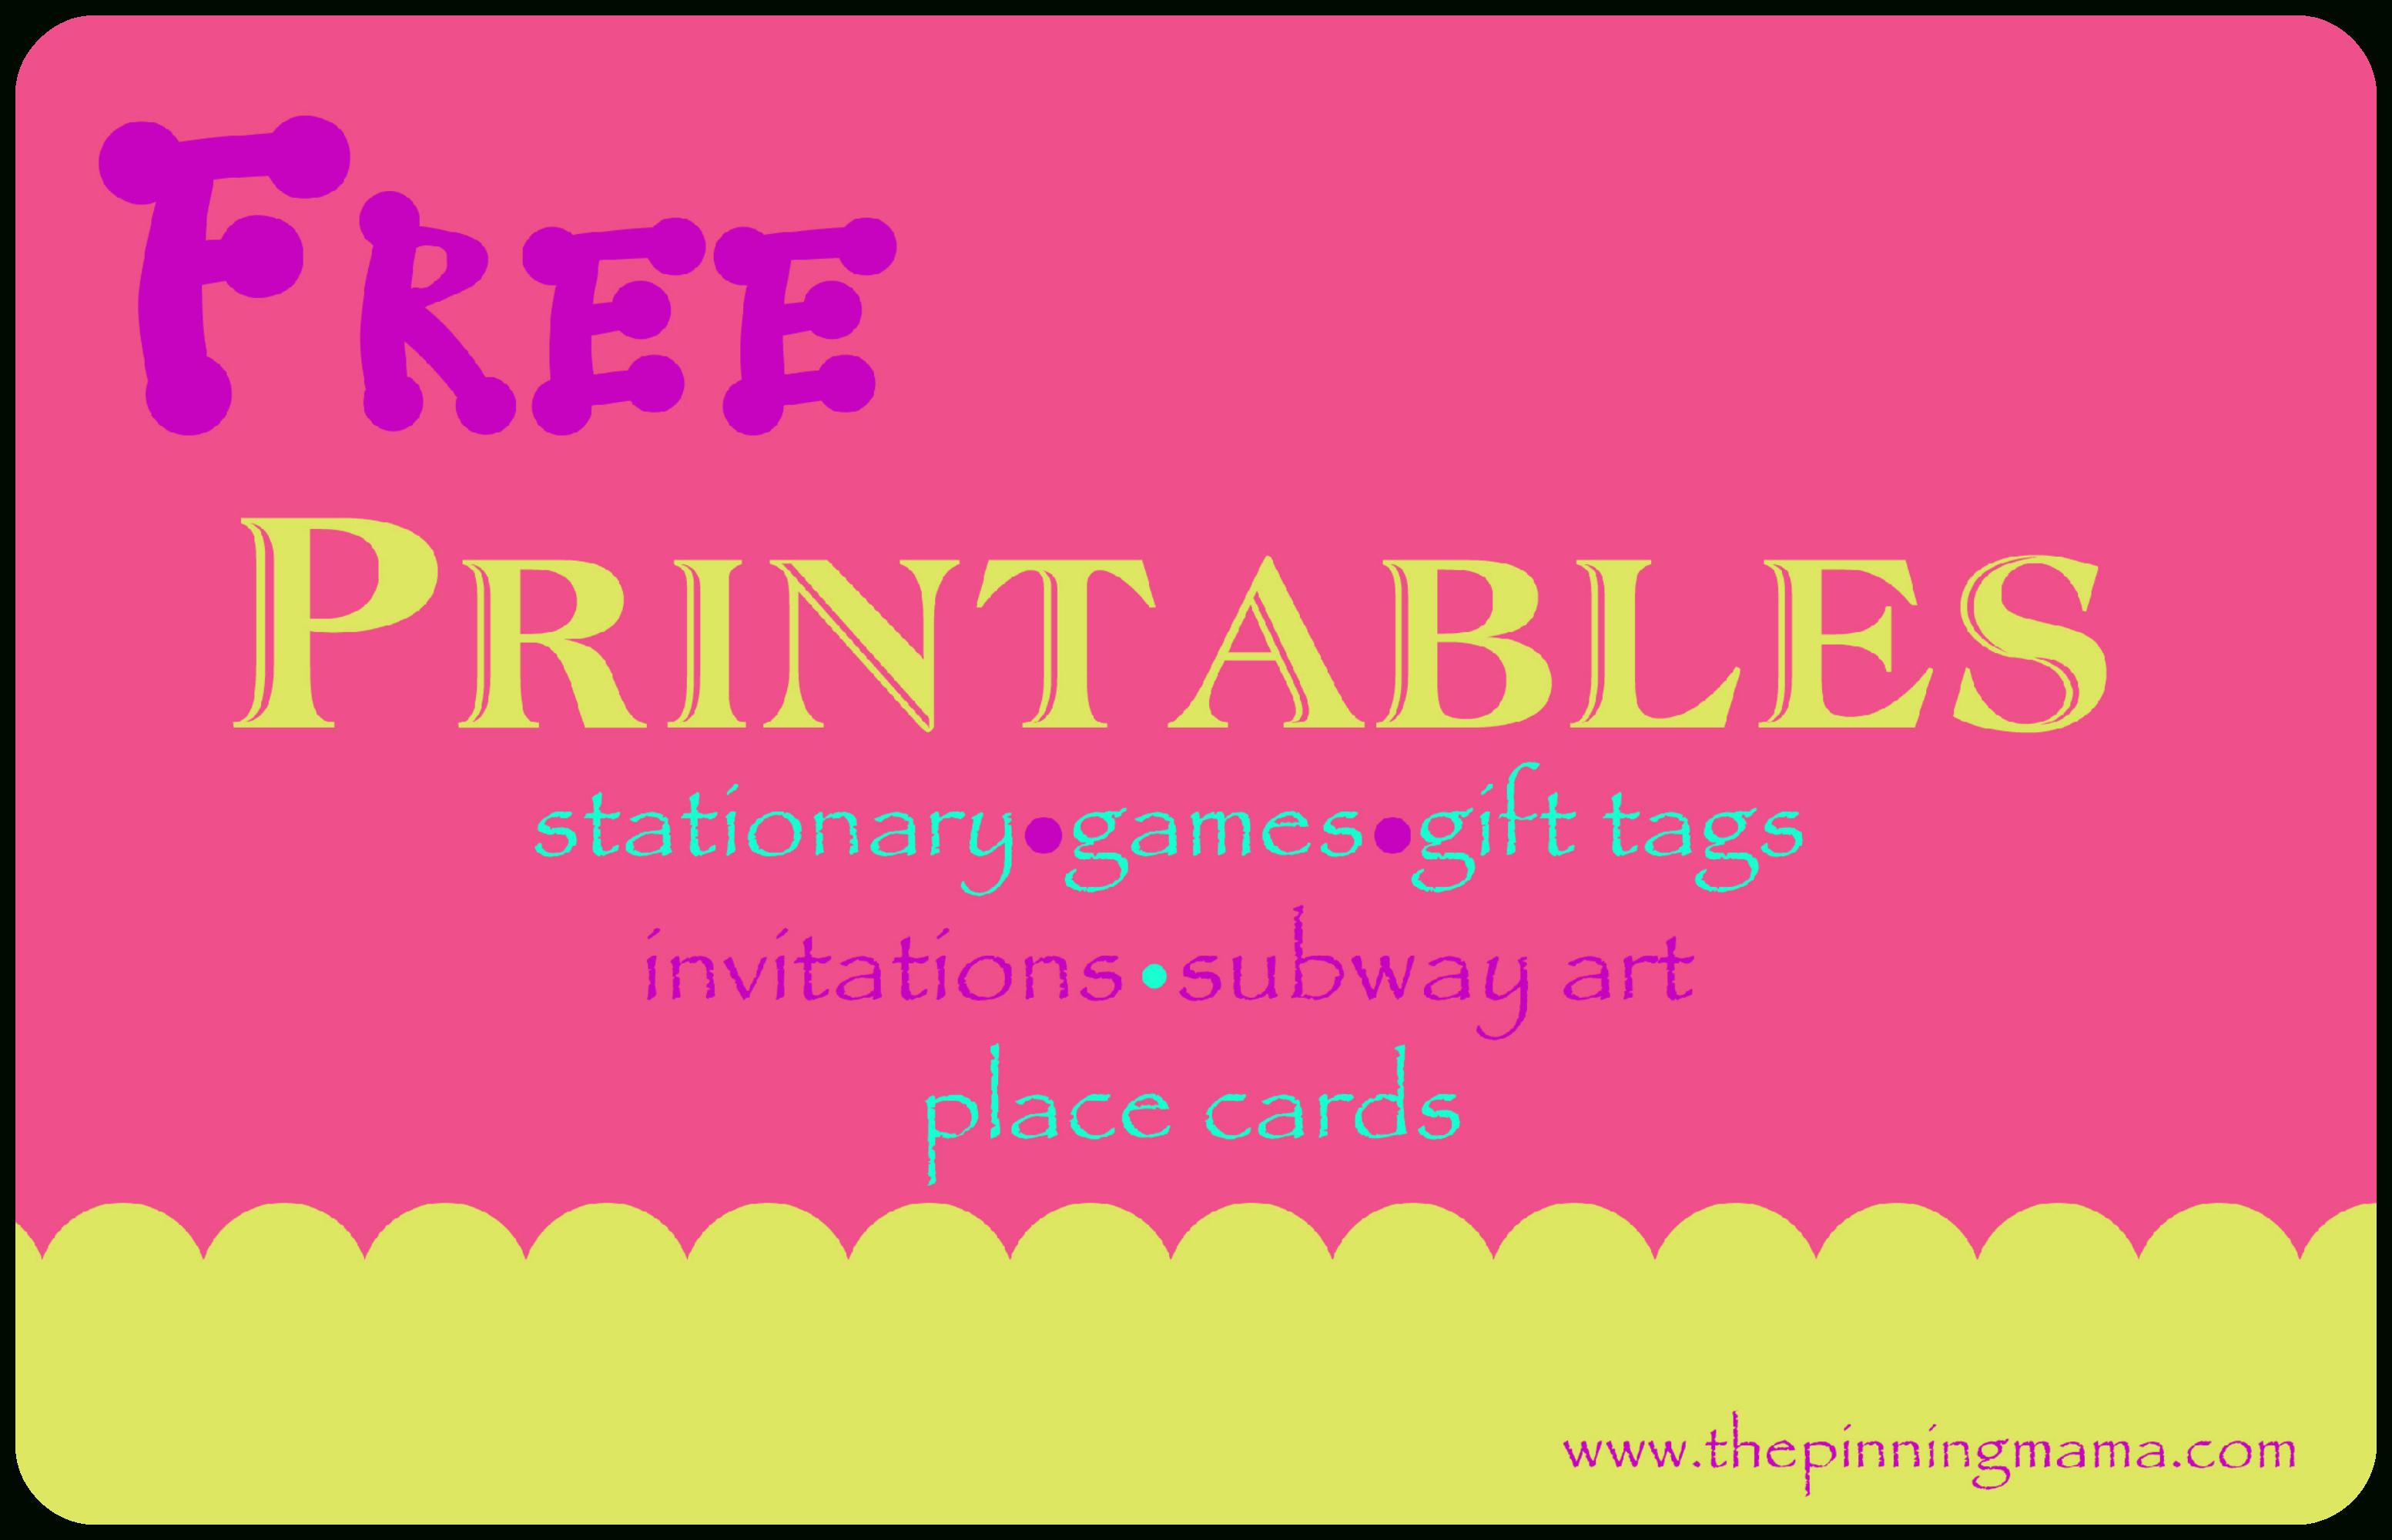 Photo : Free Printable Baby Shower Image - Free Printable Baby Shower Cards Templates